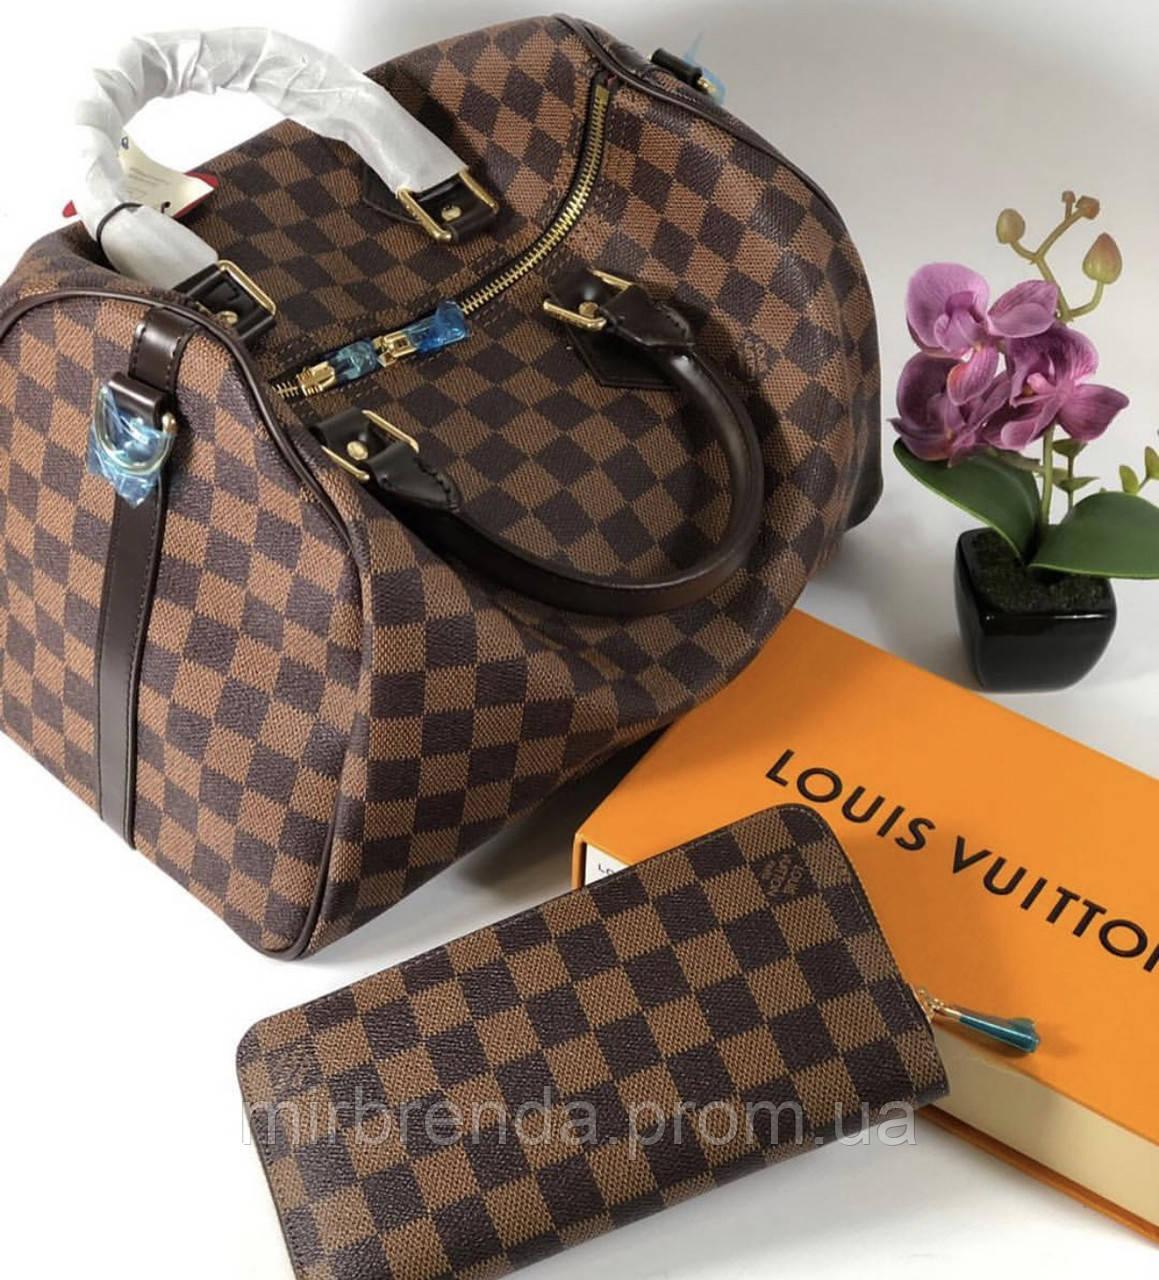 06c2cd3f74e9 Сумки Louis Vuitton (Луи Вуиттон) в наличии, цена 1 400 грн., купить ...